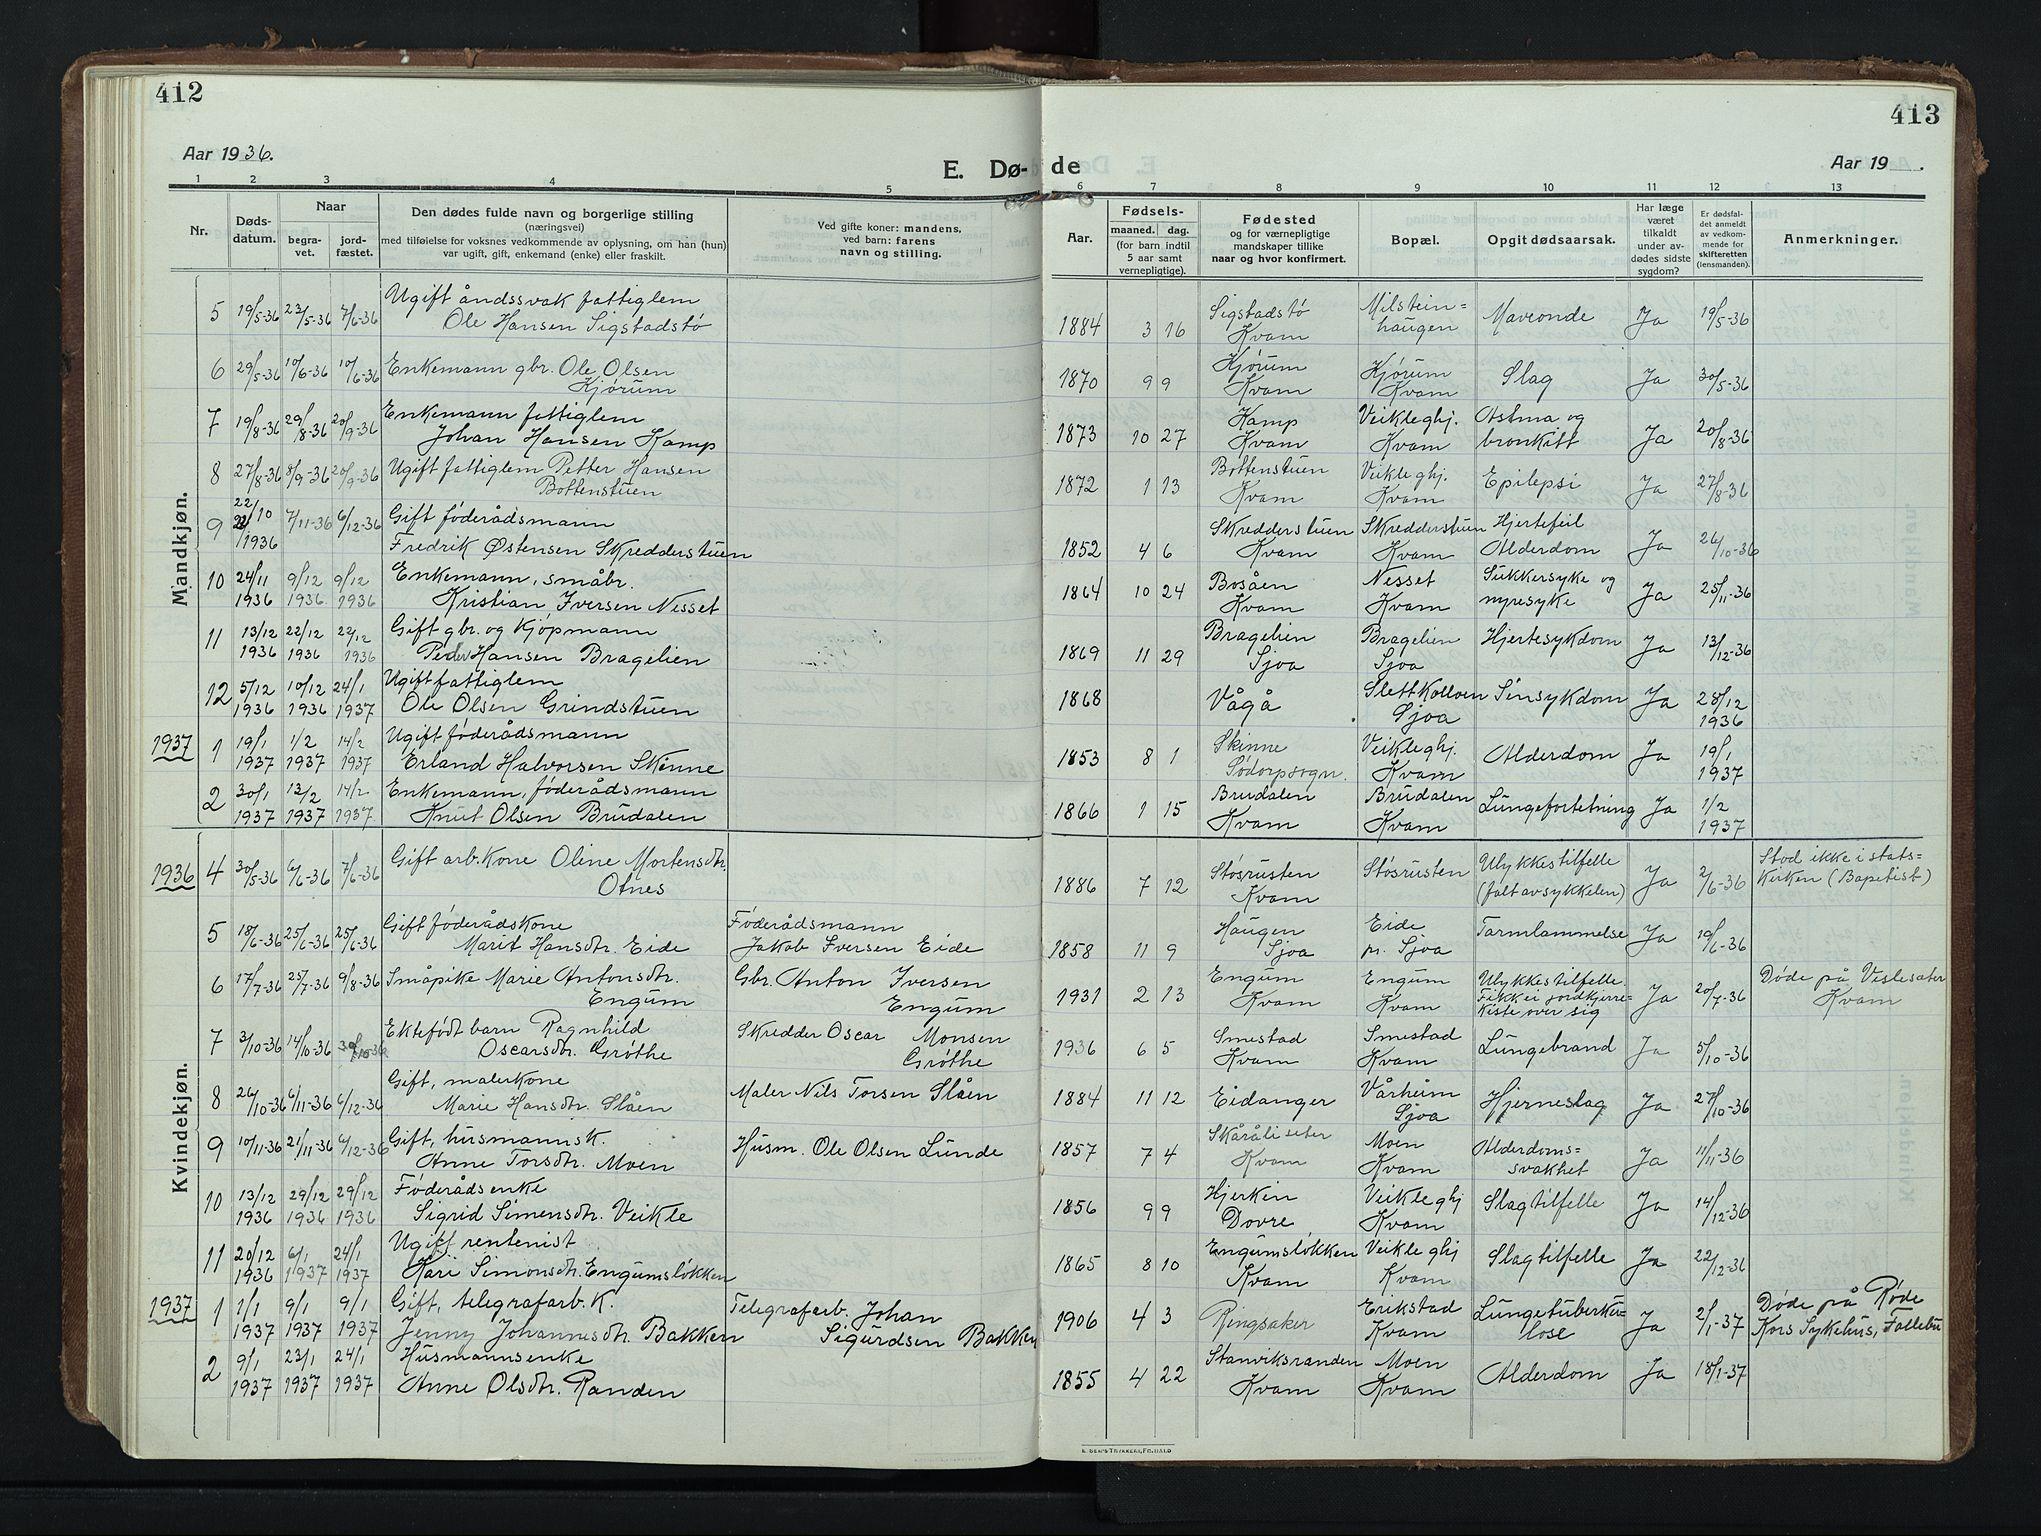 SAH, Nord-Fron prestekontor, Klokkerbok nr. 8, 1915-1948, s. 412-413